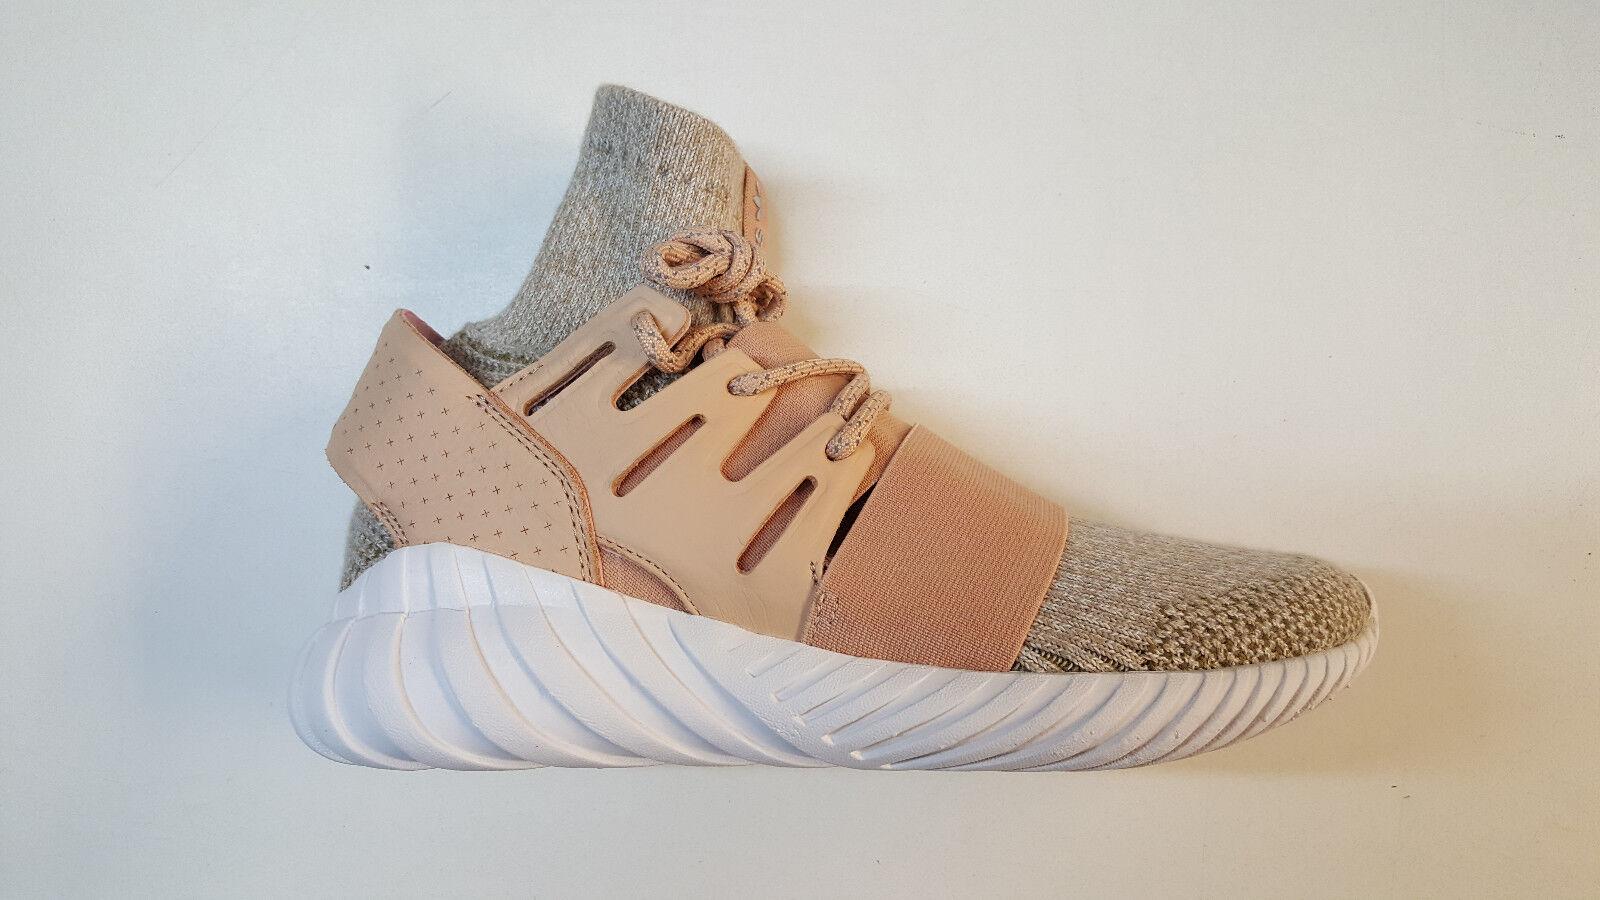 Adidas Originals Tubular Doom Primeknit Beige Peach Mens shoes BB2390 1705-82